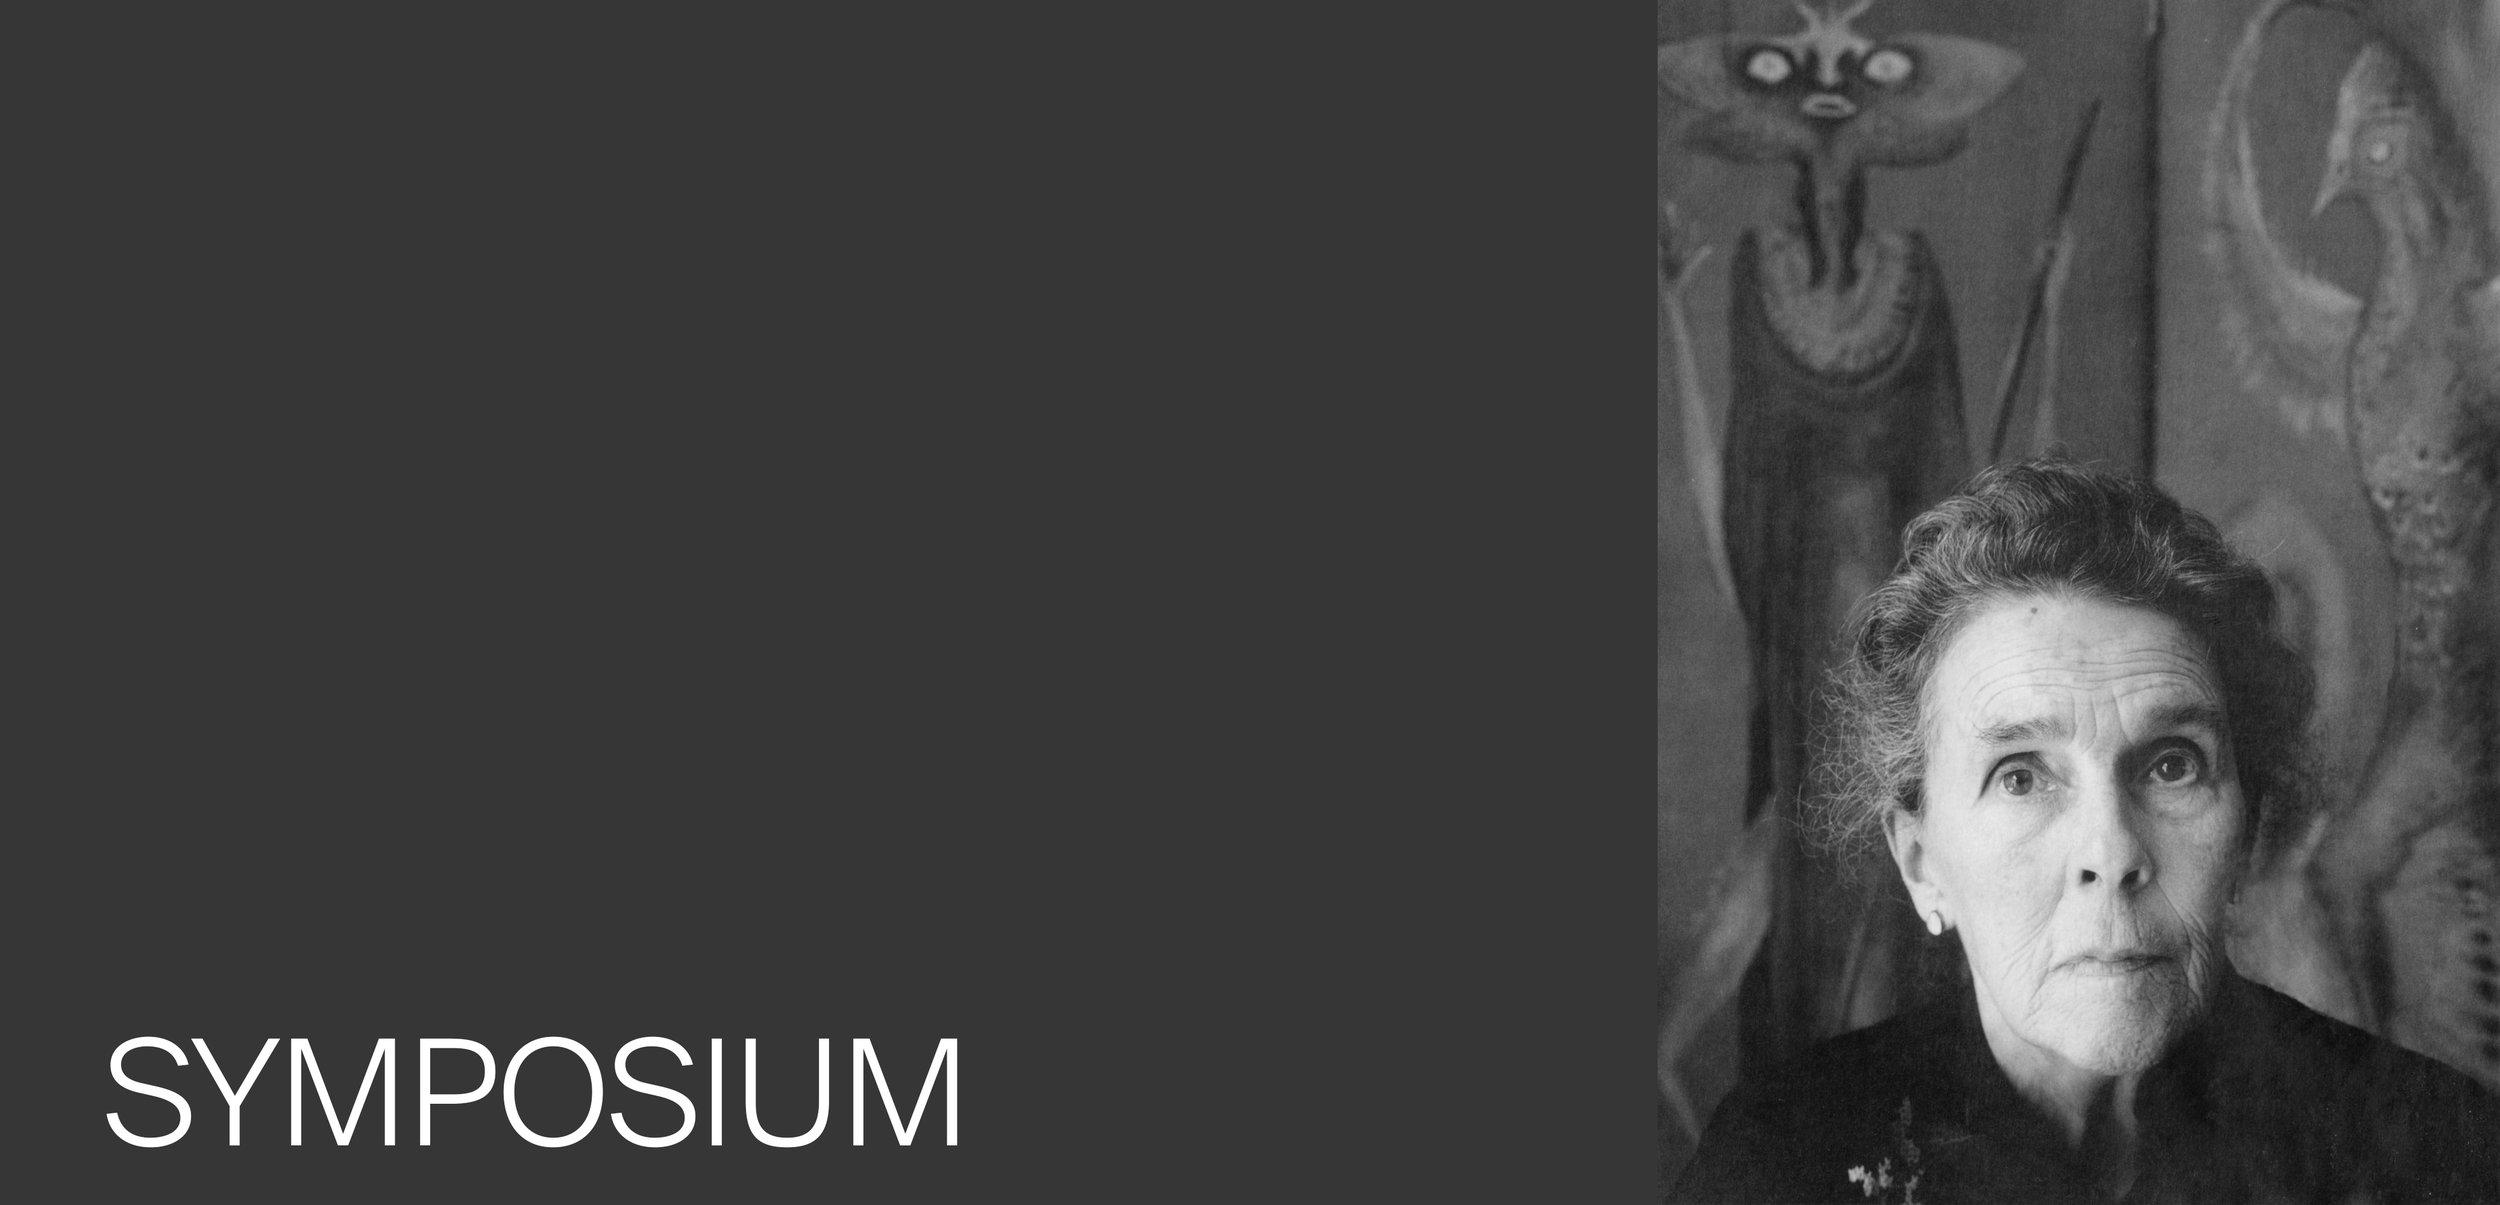 GALLERY EVENT   Symposium: Leonora Carrington   June 6 — 7, 2019 | 926 Madison Avenue, New York